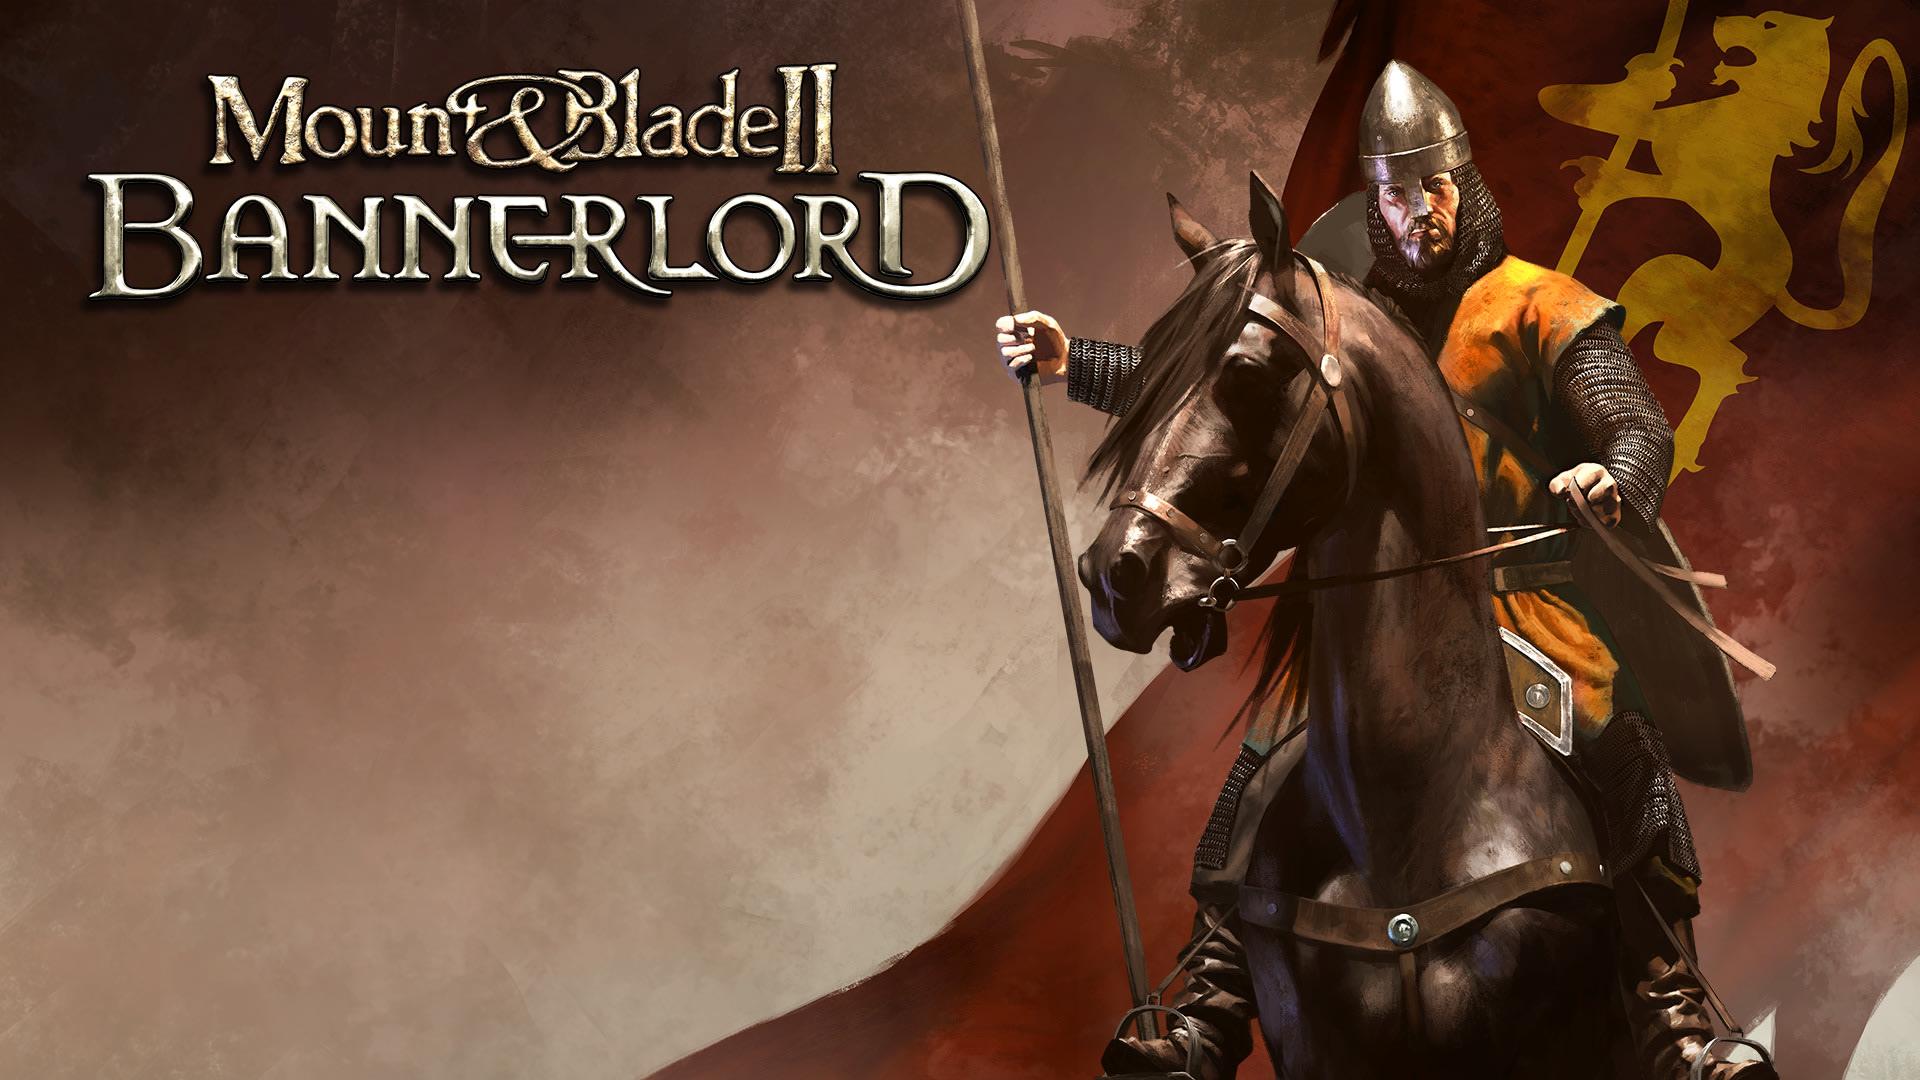 Mount Blade Ii Bannerlord Wallpaper Hd Games 4k Wallpapers